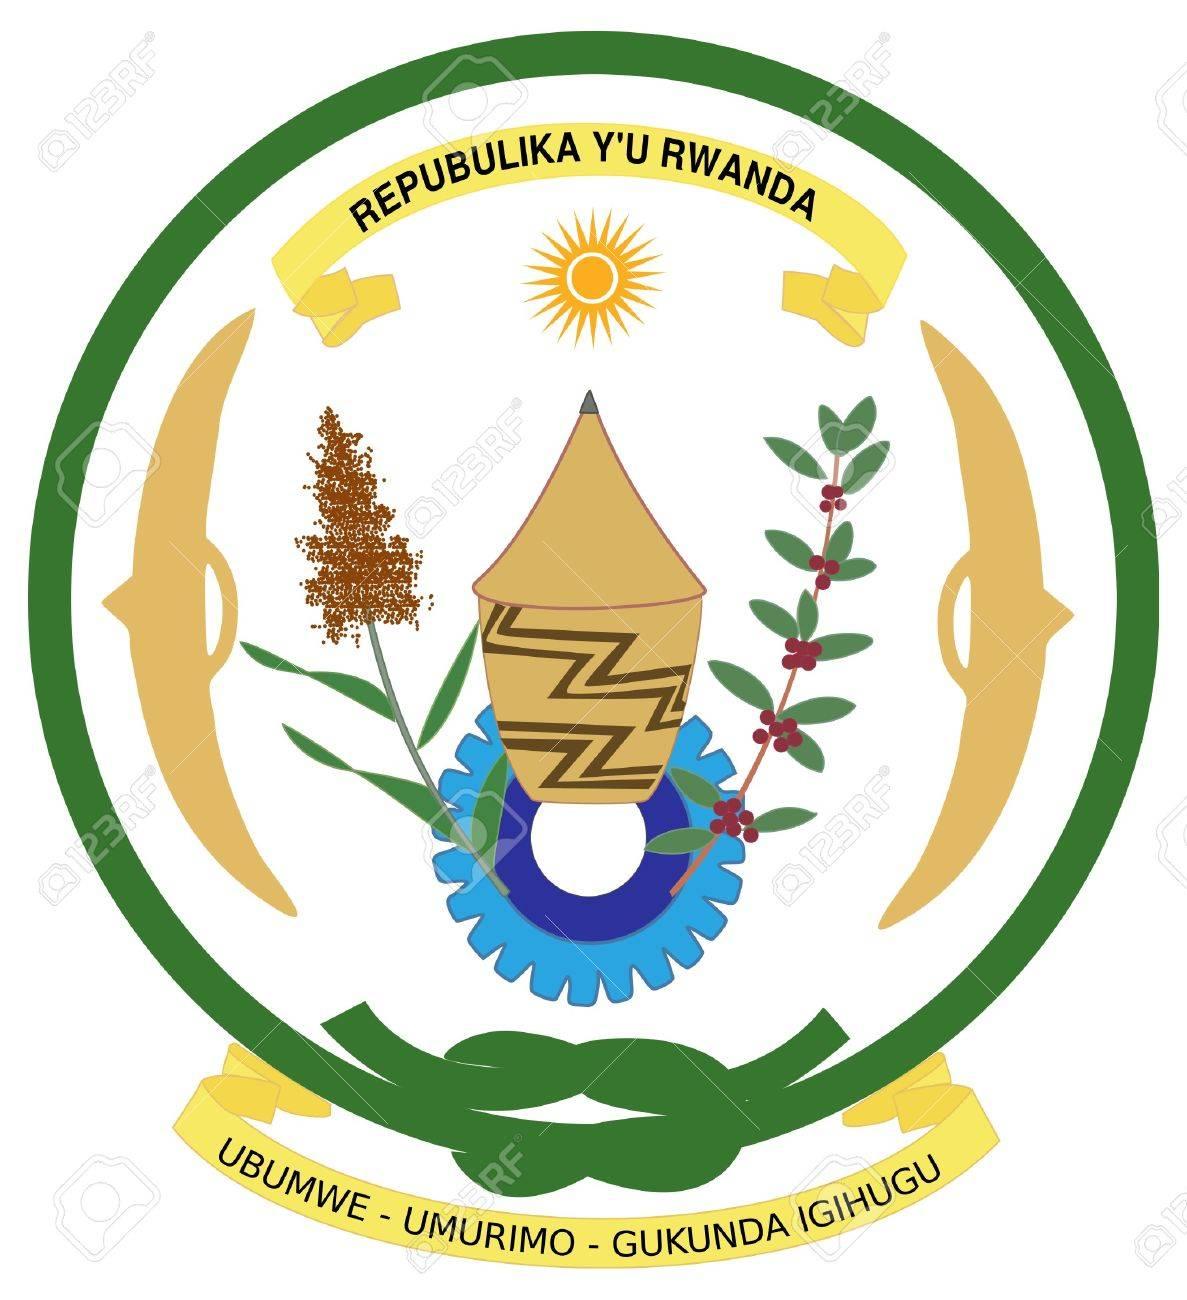 Rwanda coat of arms, seal or national emblem, isolated on white